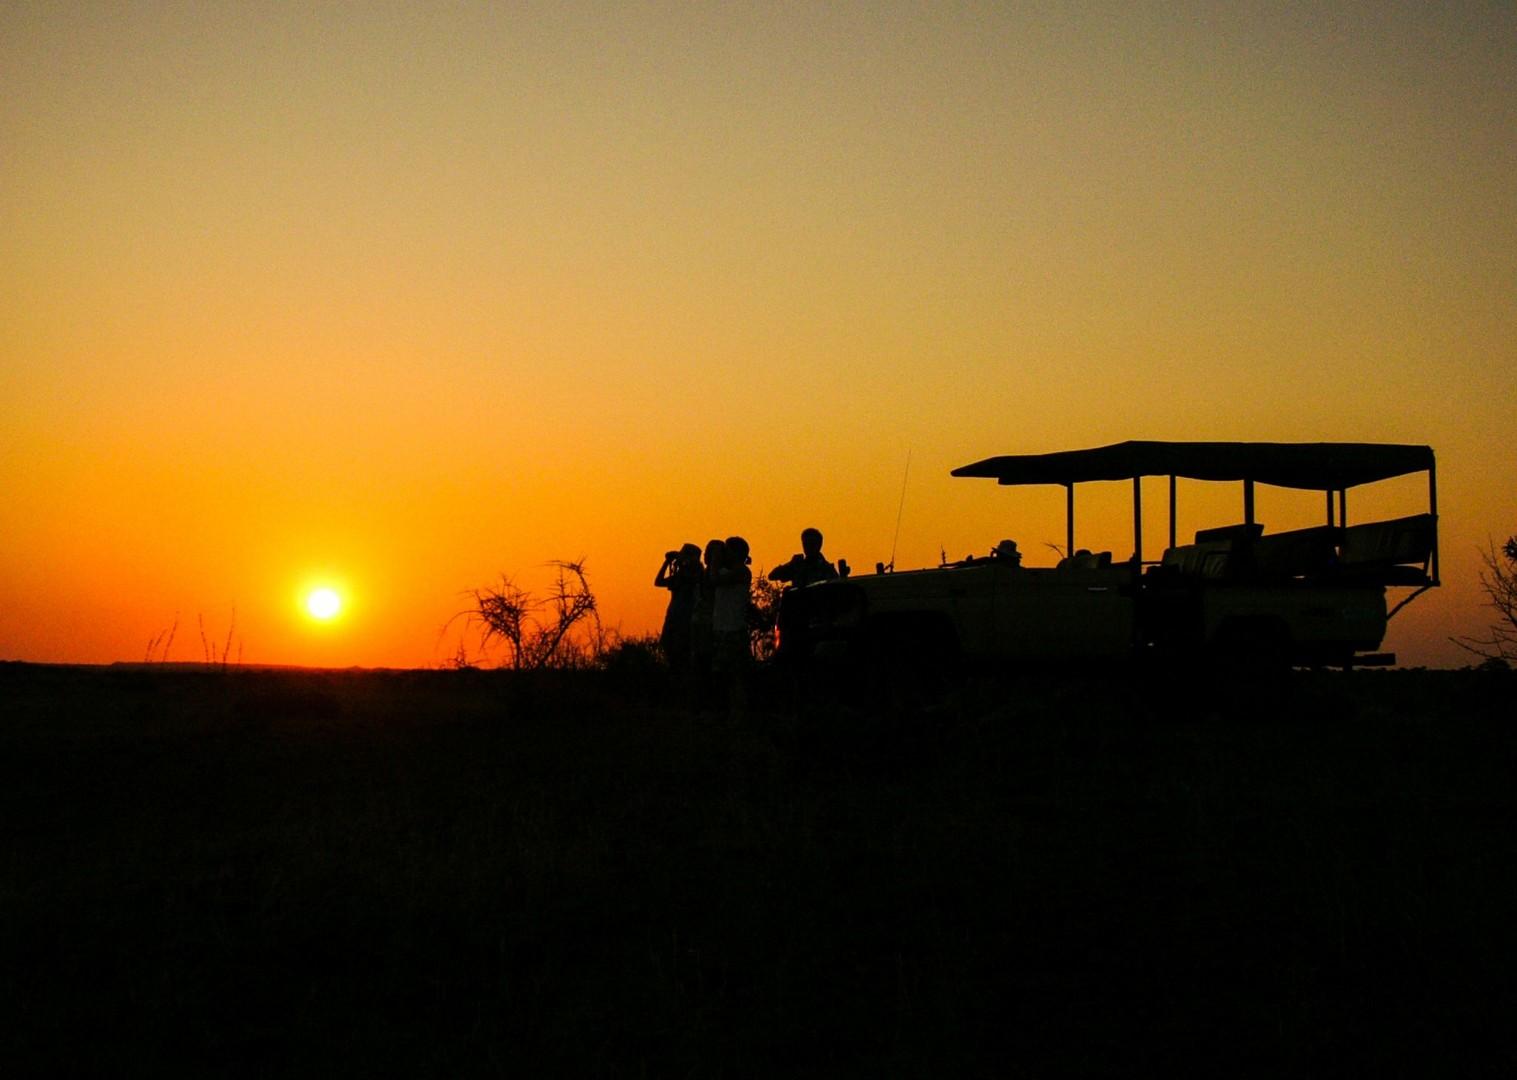 sunset-south-africa-and-botswana-trip-mountain-bike-holiday.jpg - NEW! South Africa and Botswana - Mountain Biking